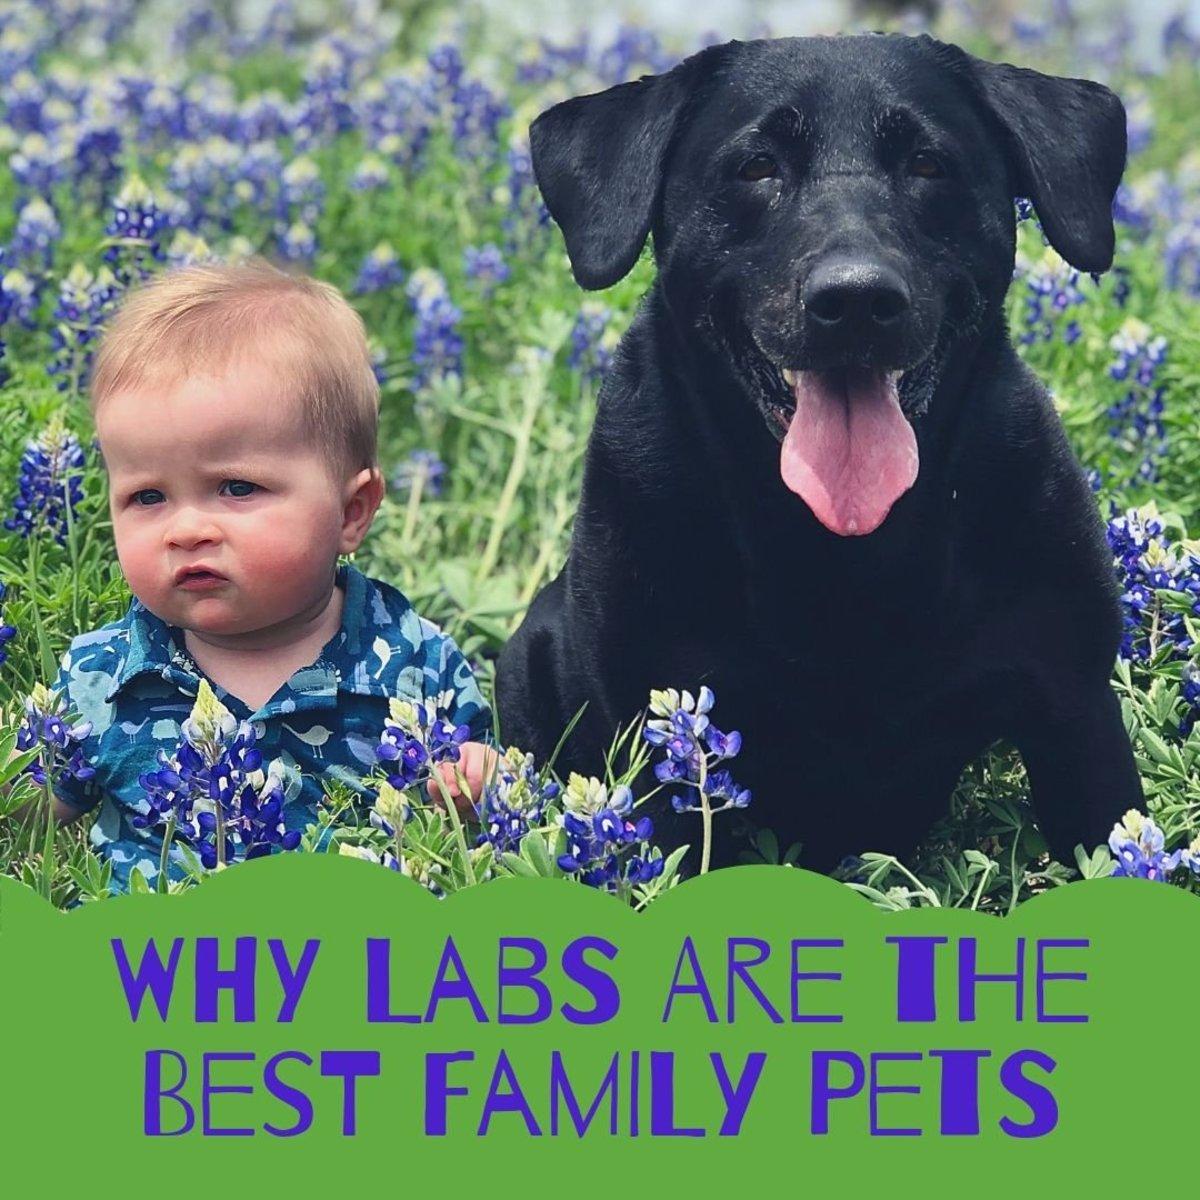 10 Reasons Labrador Retrievers Make Great Family Pets